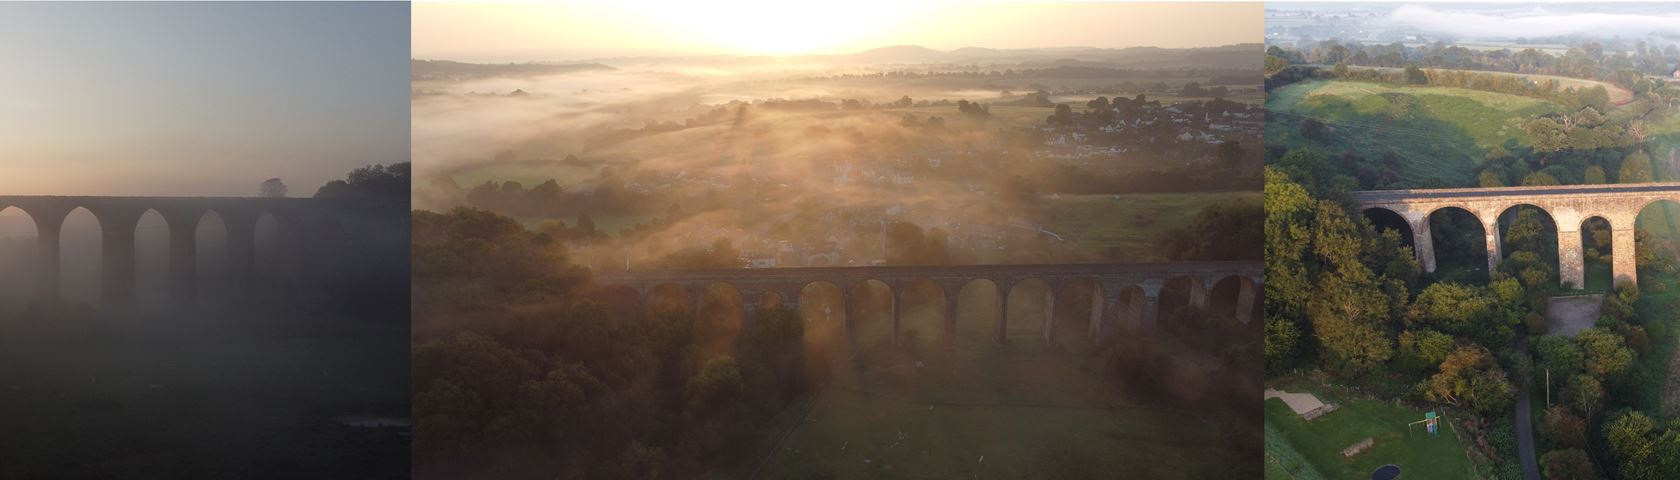 Pensford Viaduct